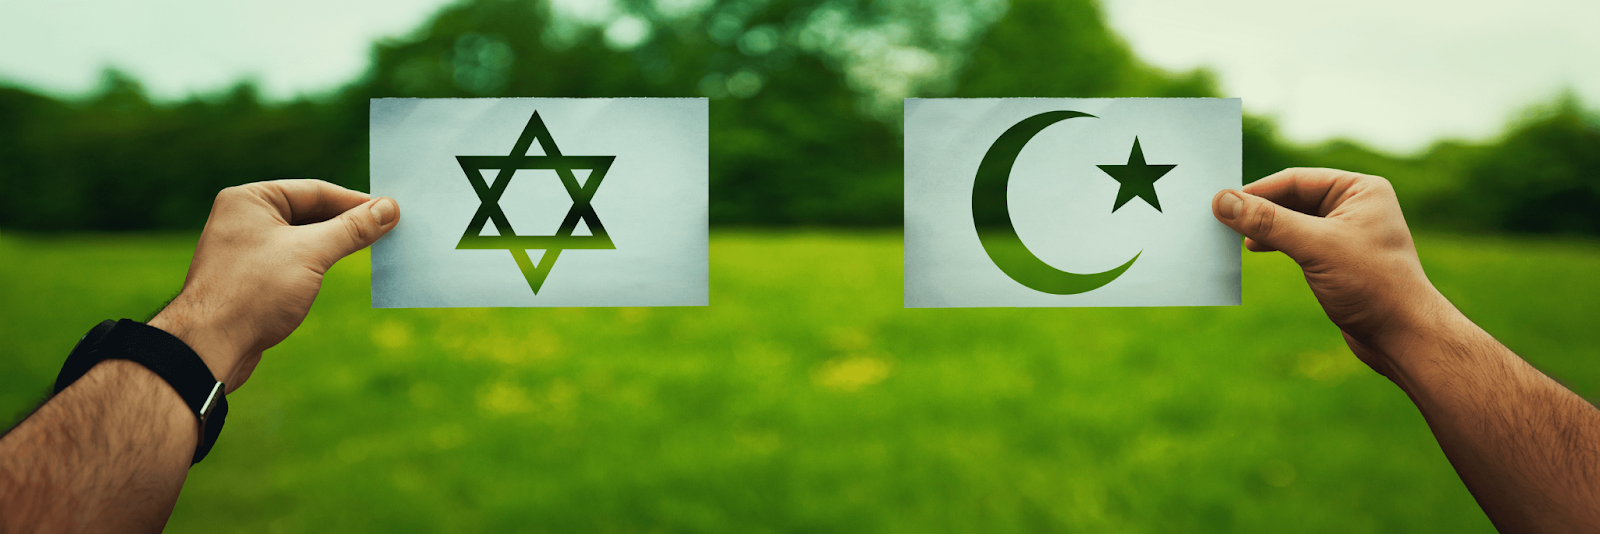 Yom kippur and Ashura